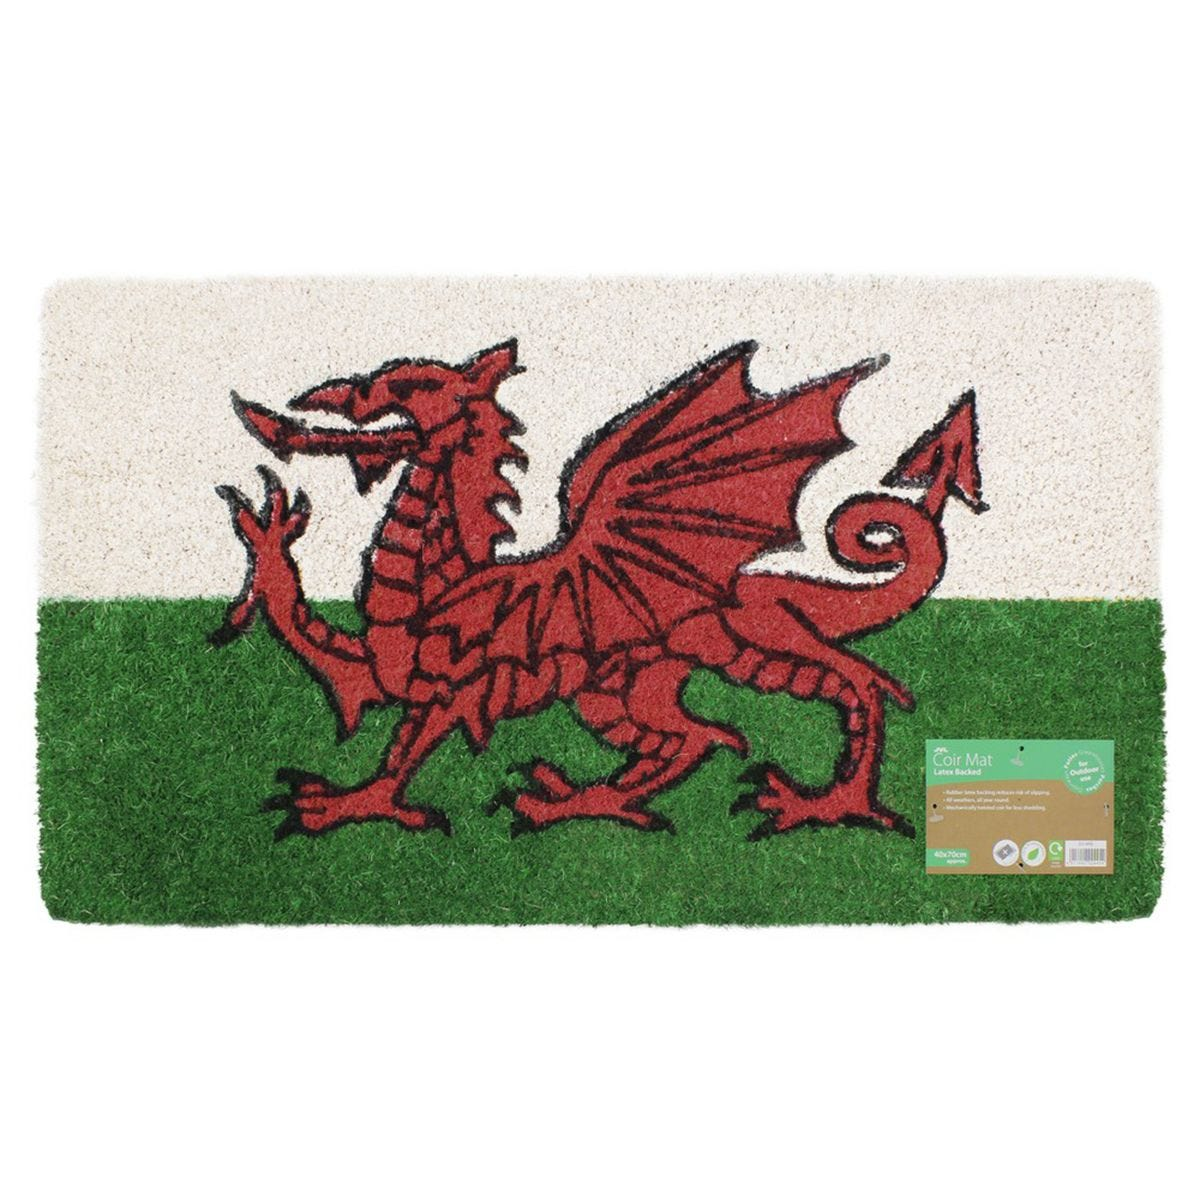 JVL 'Cymru Welsh Dragon' Entrance Door Mat - 40x70